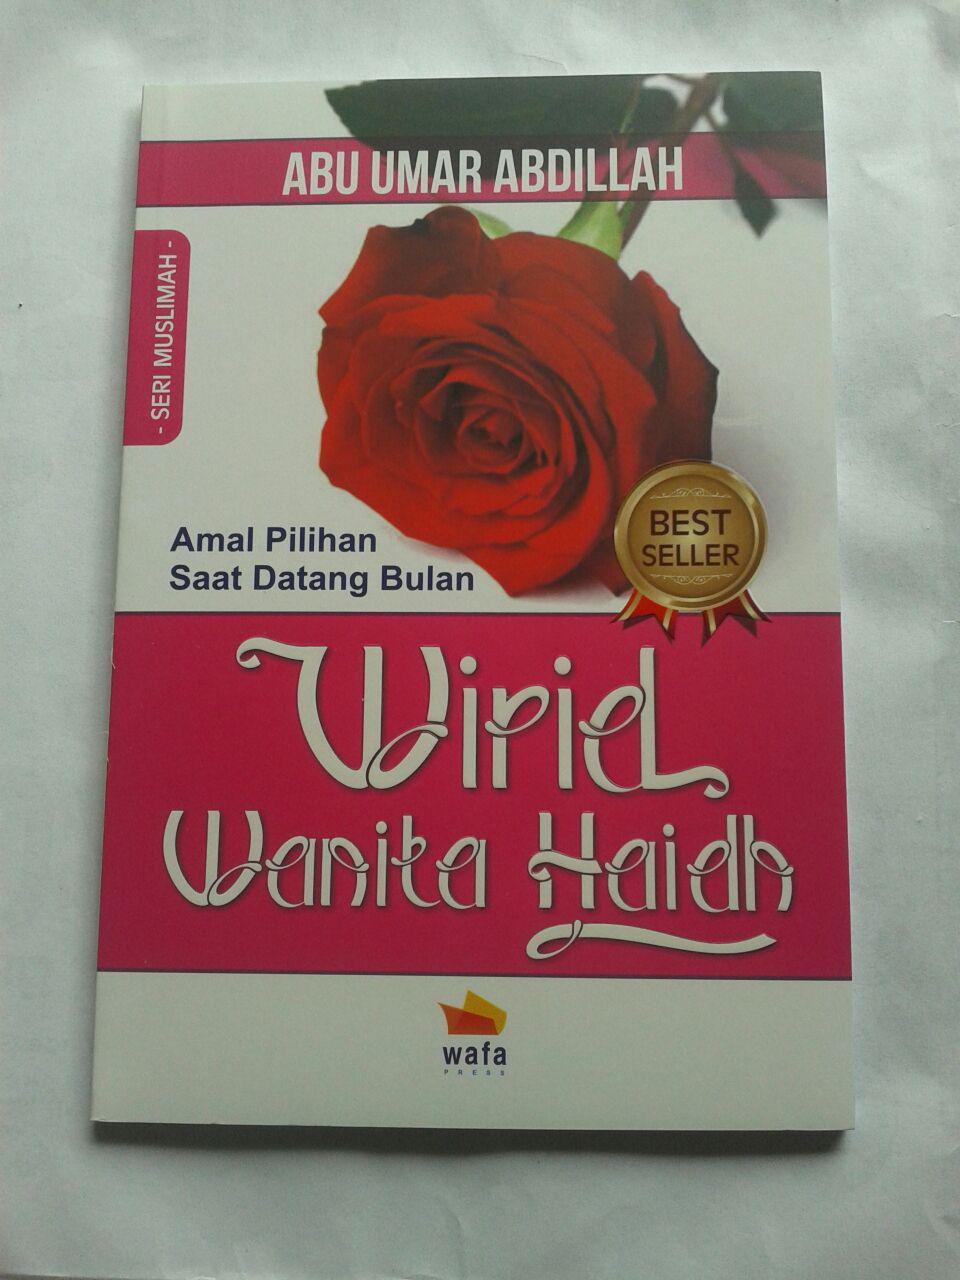 Buku Wirid Wanita Haidh Amal Pilihan Saat Datang Bulan cover